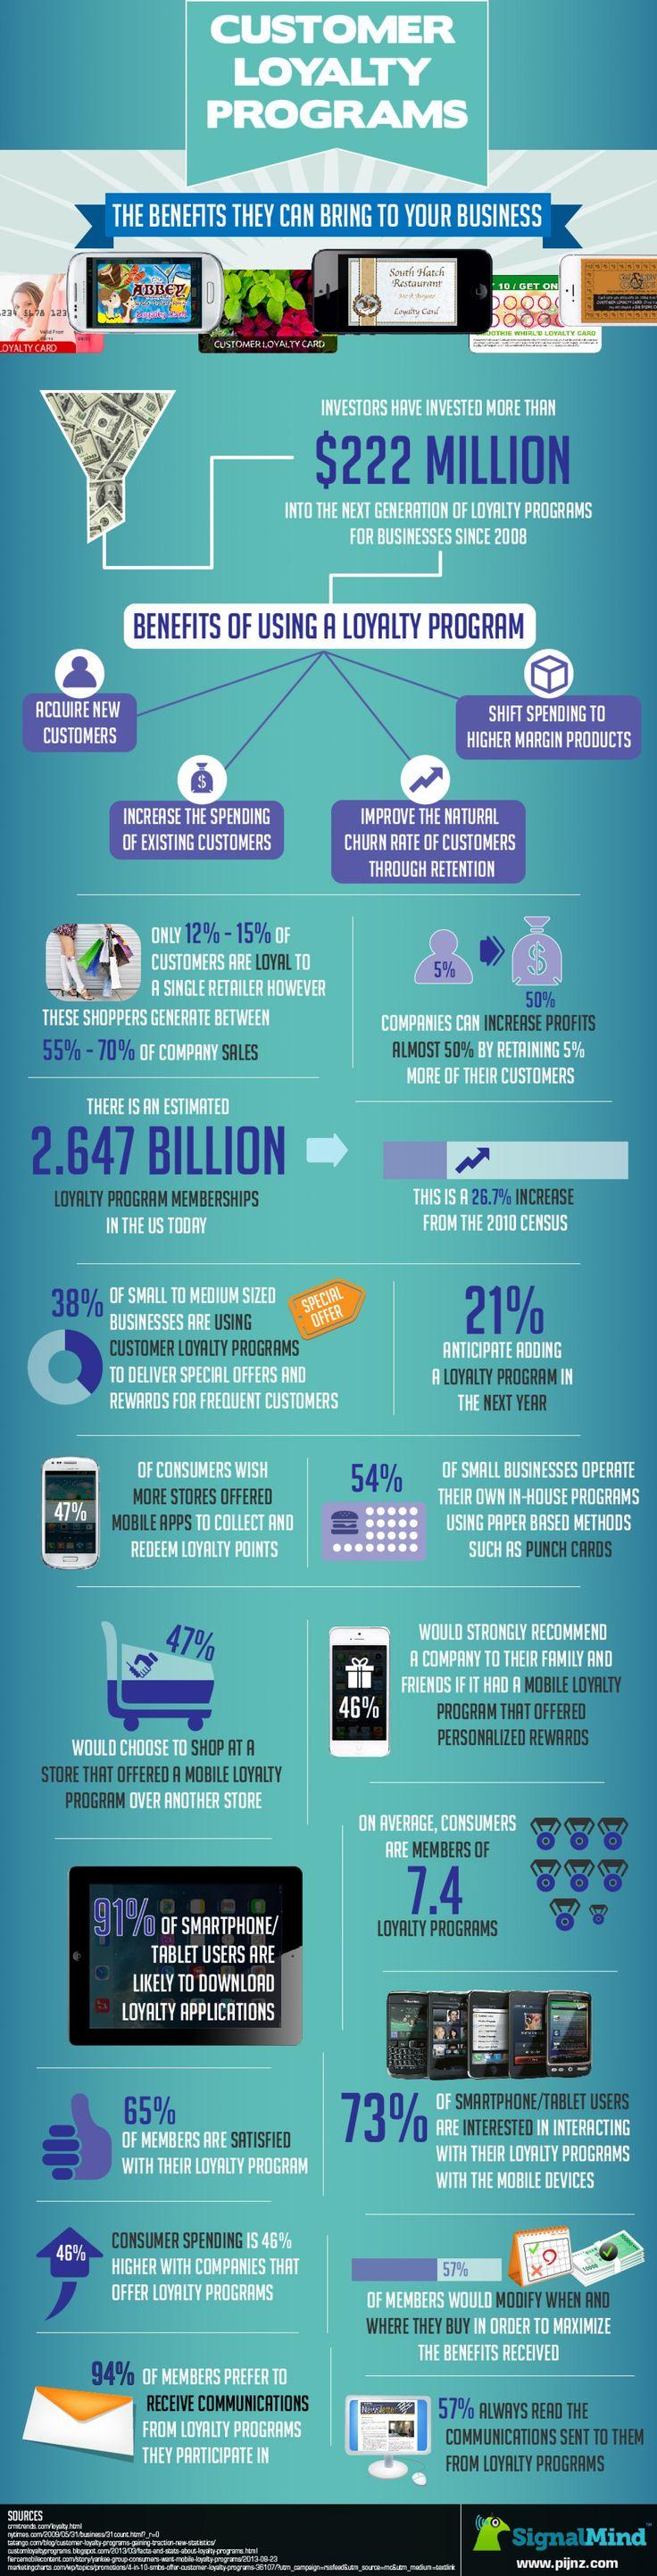 The Benefits of #CustomerLoyalty Programs